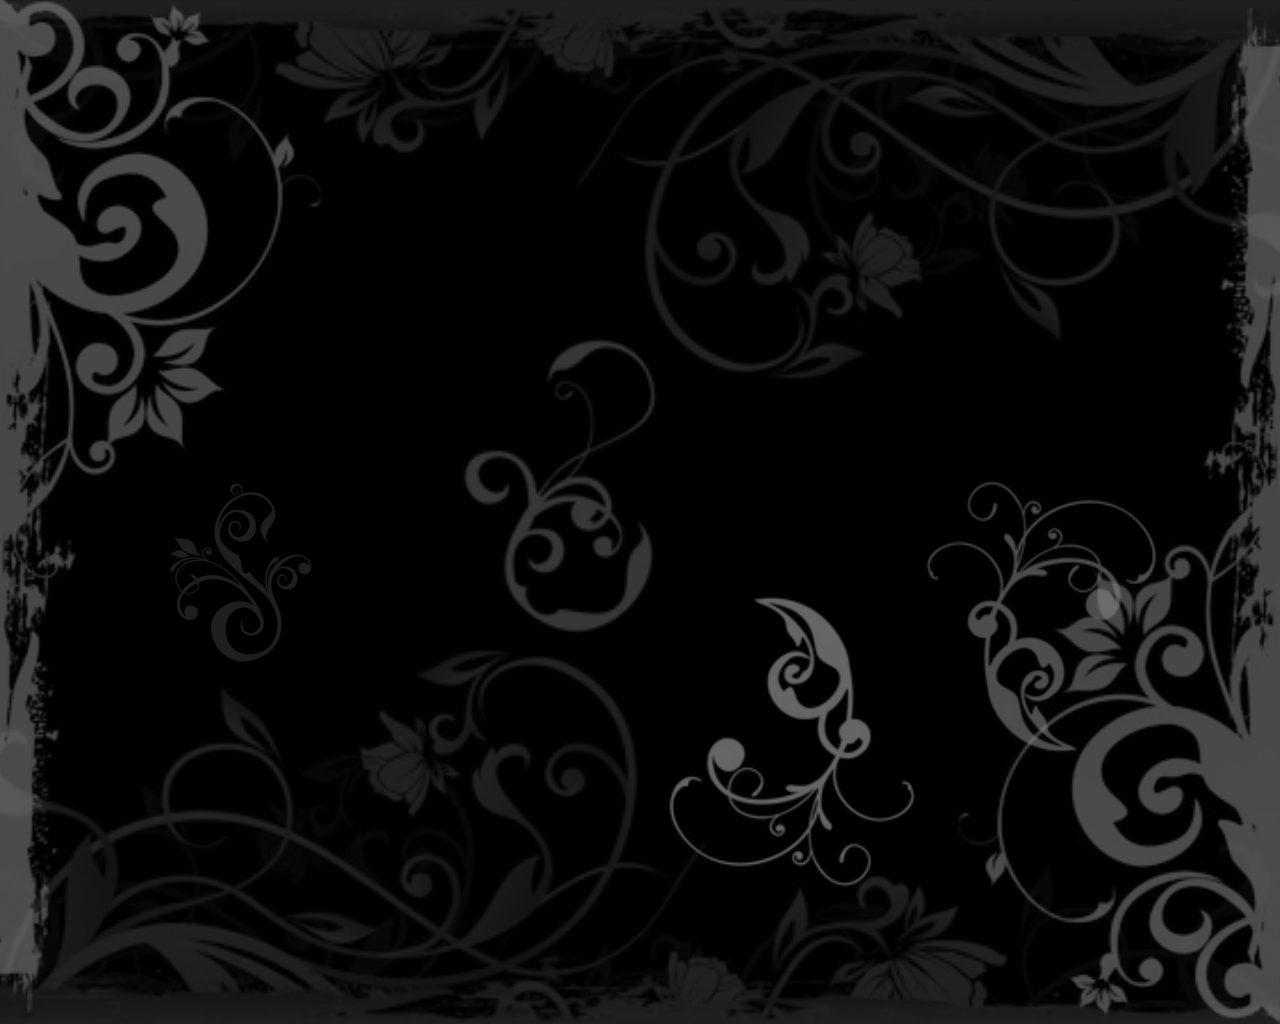 http://1.bp.blogspot.com/-77kyUmhTlPg/T72Vc6we2vI/AAAAAAAAAIE/ltqTmwHaJps/s1600/Wallpaper+Black.jpg